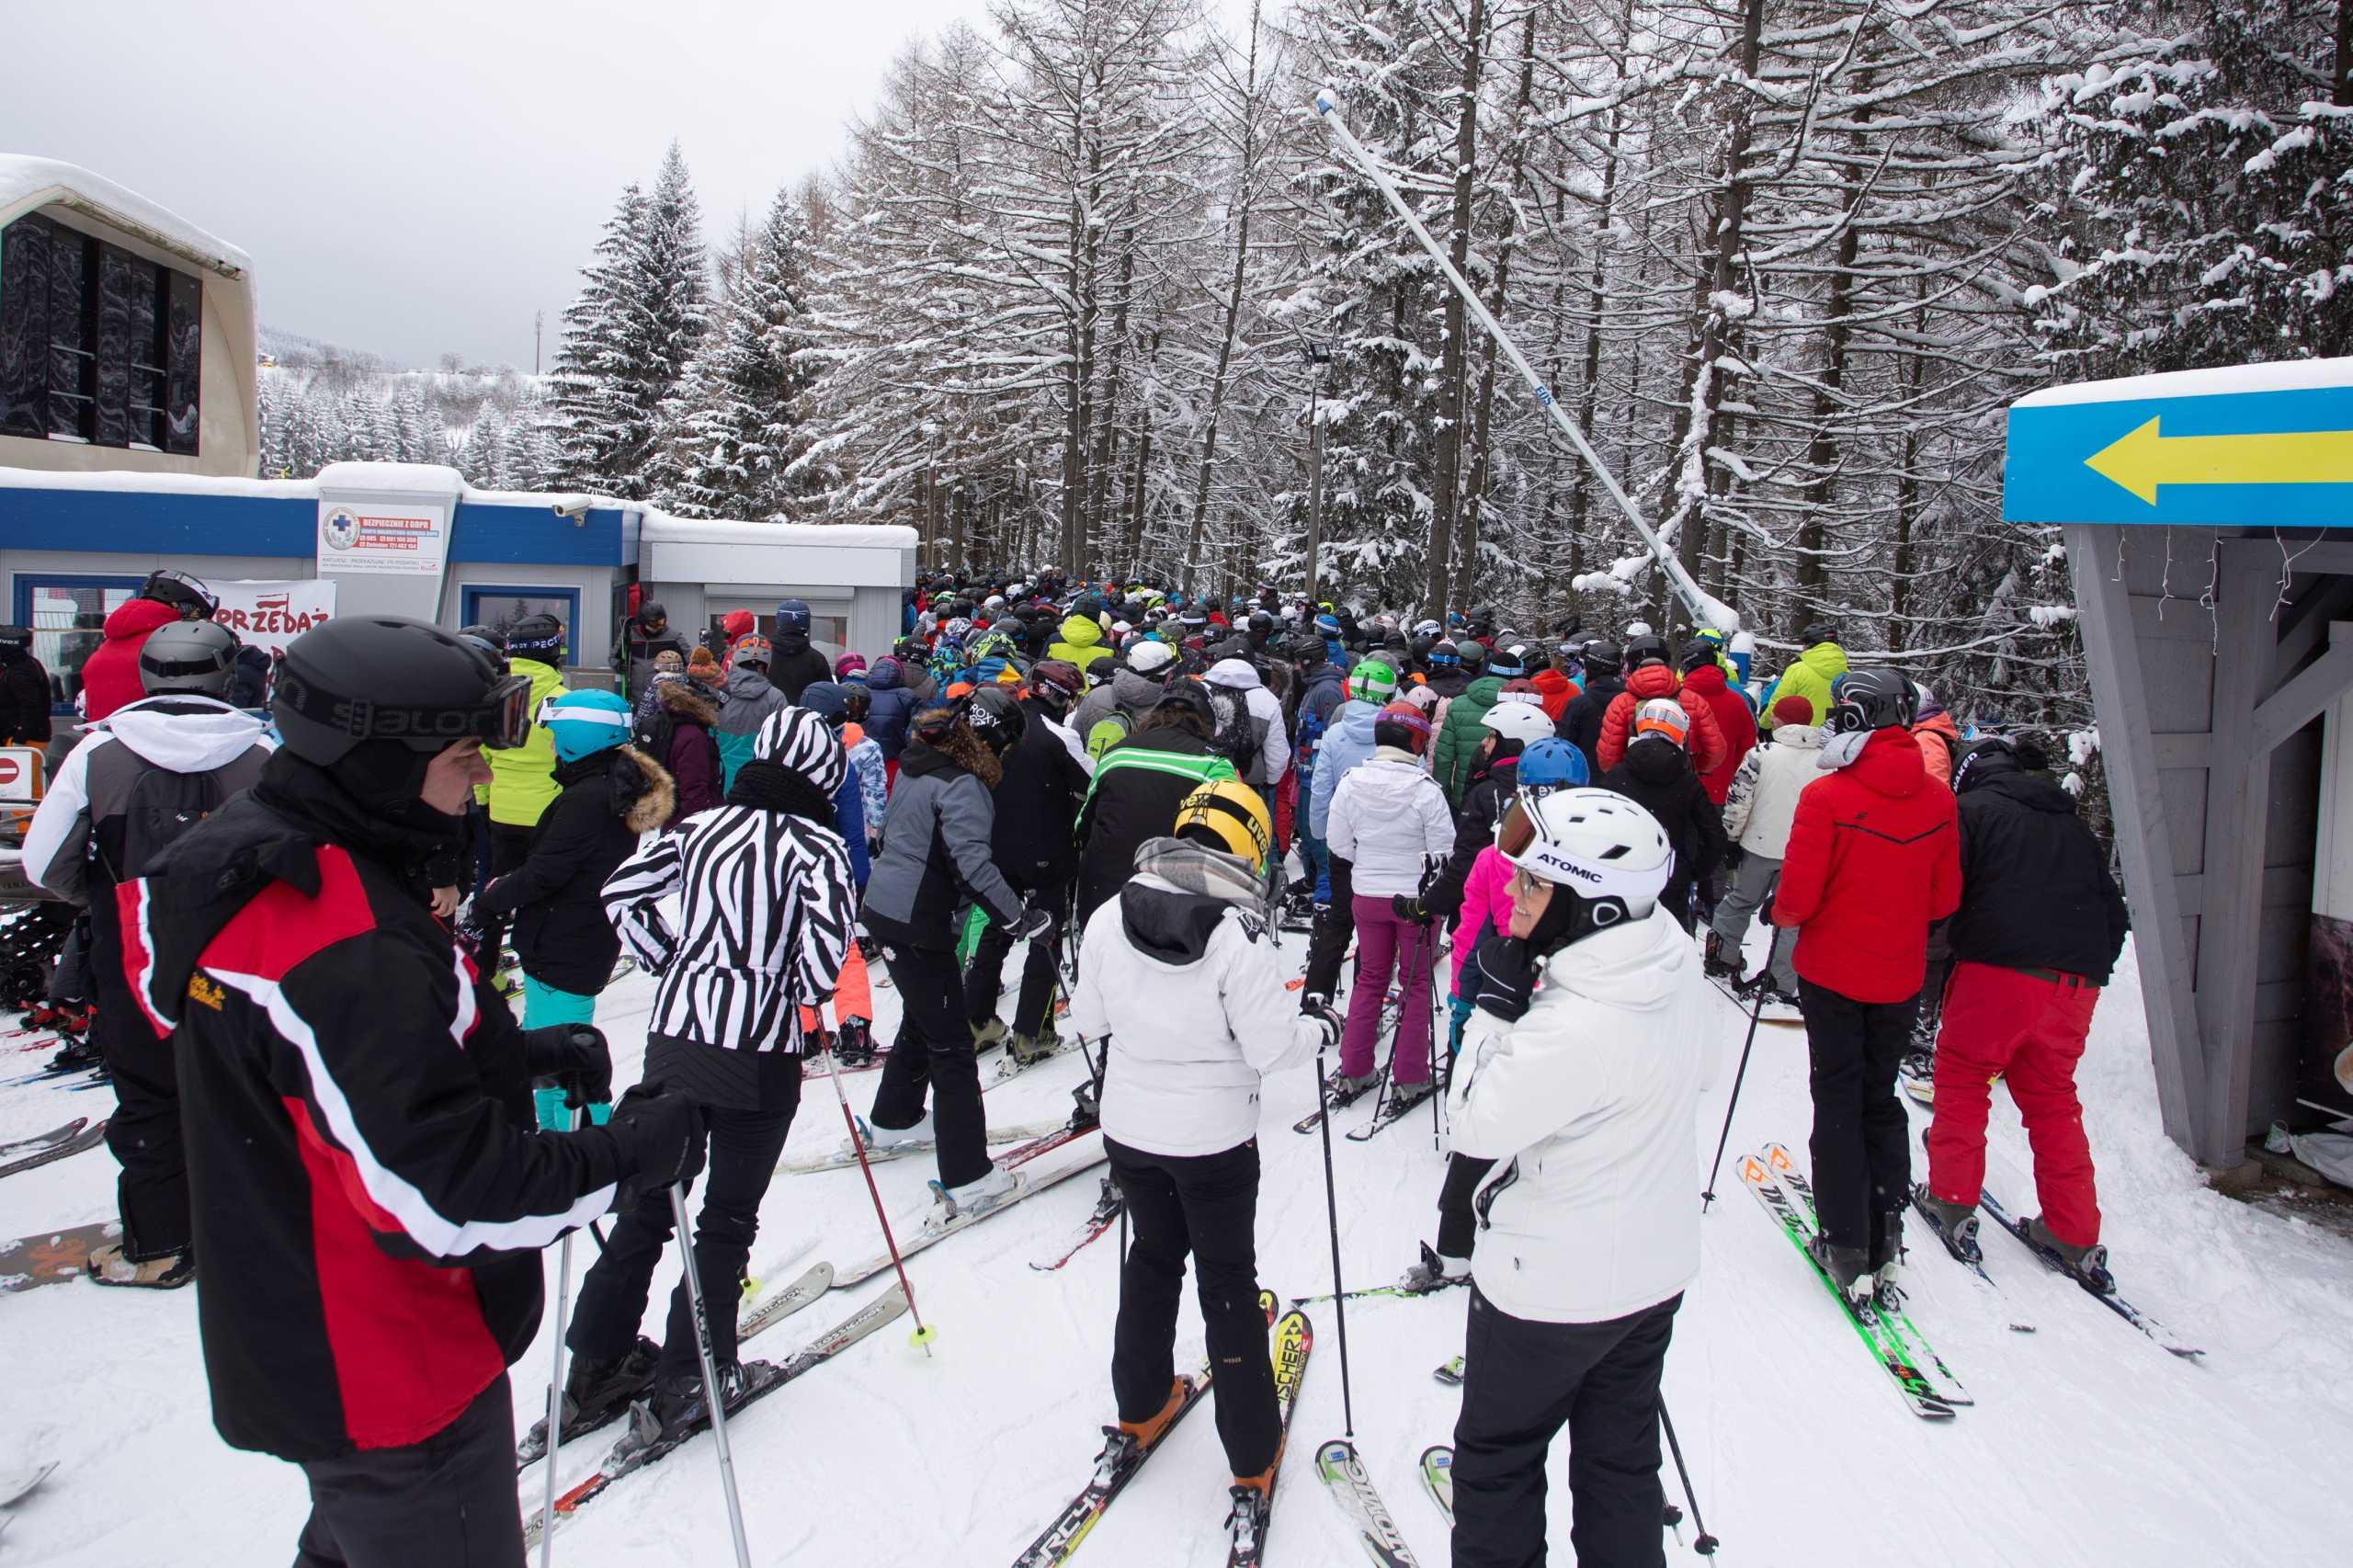 Lockdown: Έλληνες αψηφούν την πανδημία και πάνε για σκι στη Βουλγαρία